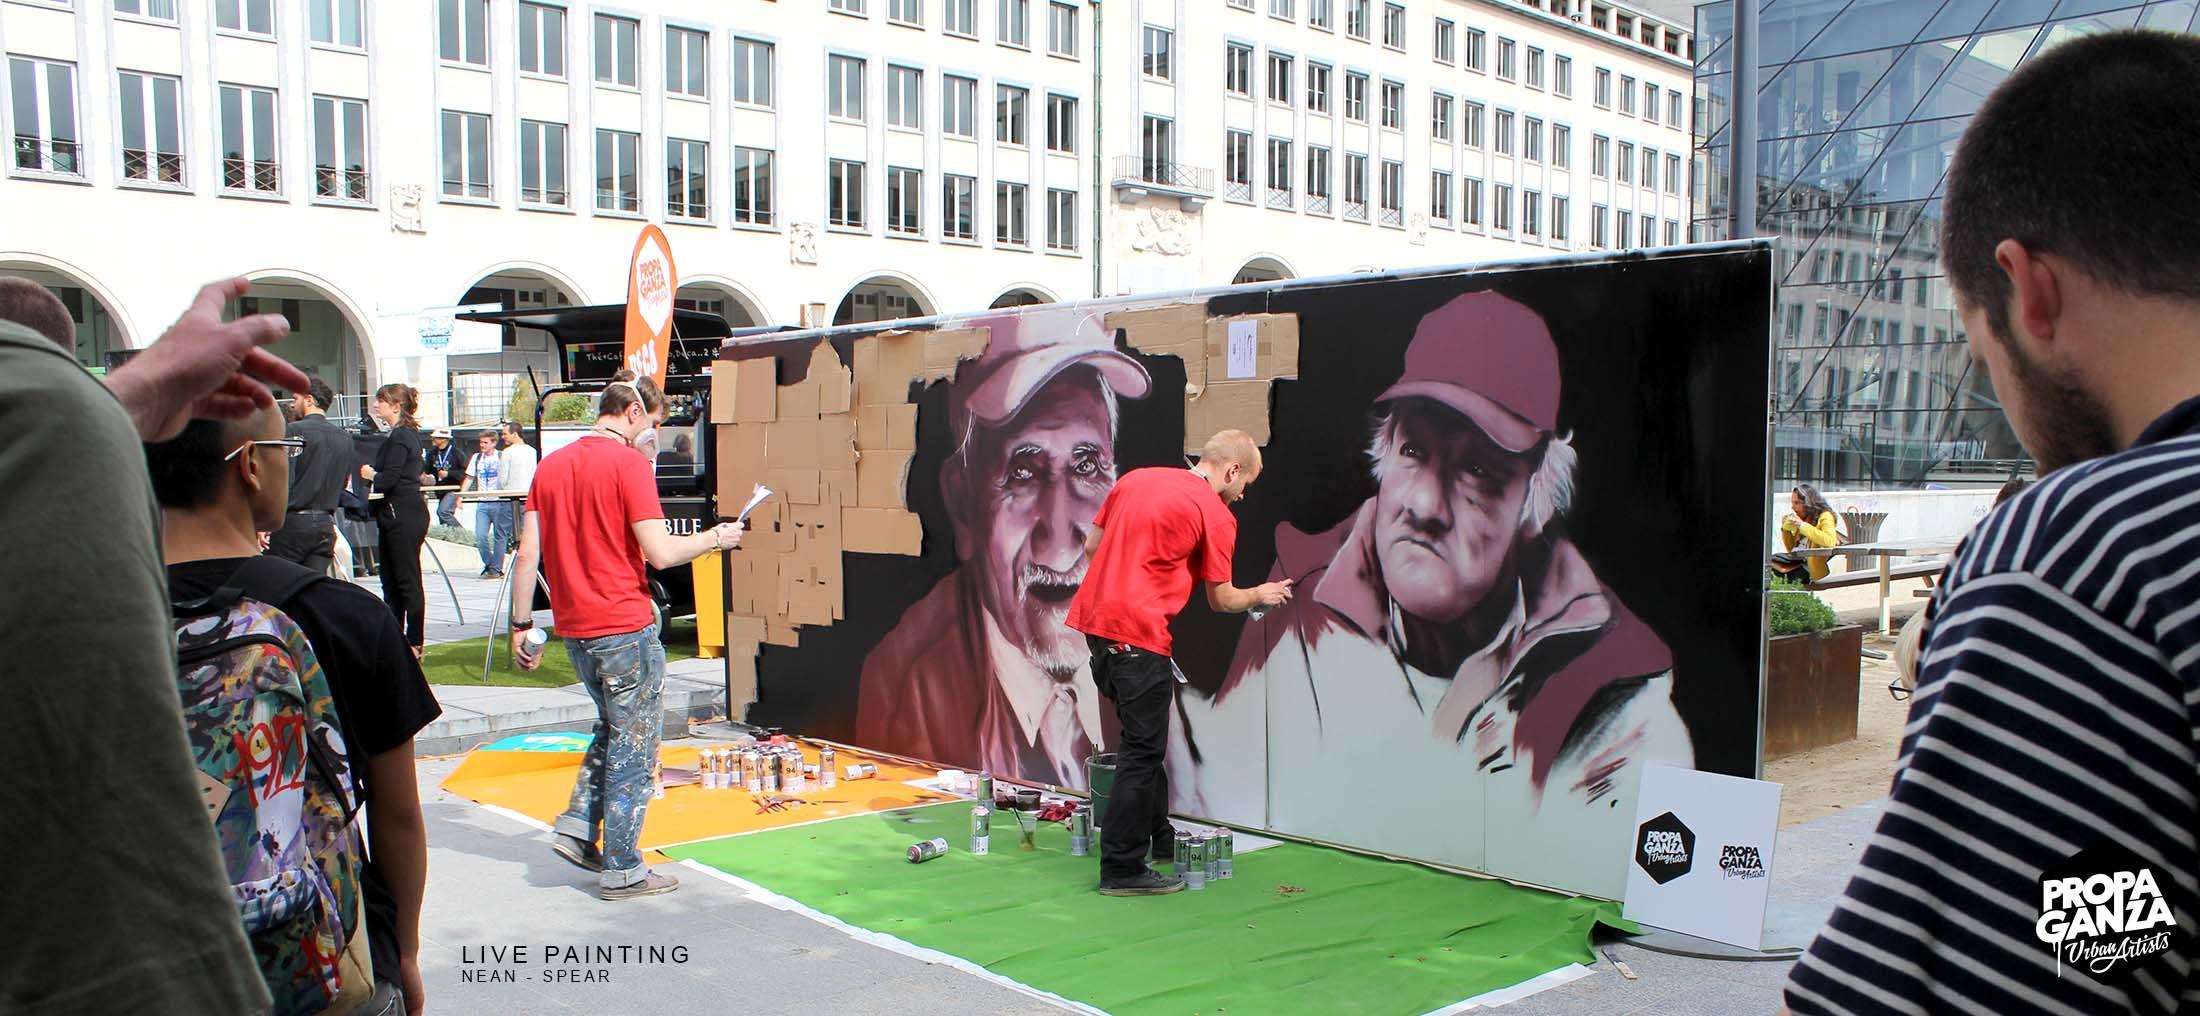 https://www.propaganza.be/wp-content/uploads/2019/04/propaganza-brussels-bruxelles-spear-nean-graffiti-plastic-live-painting-graffiti-street-art-homeless-2.jpg